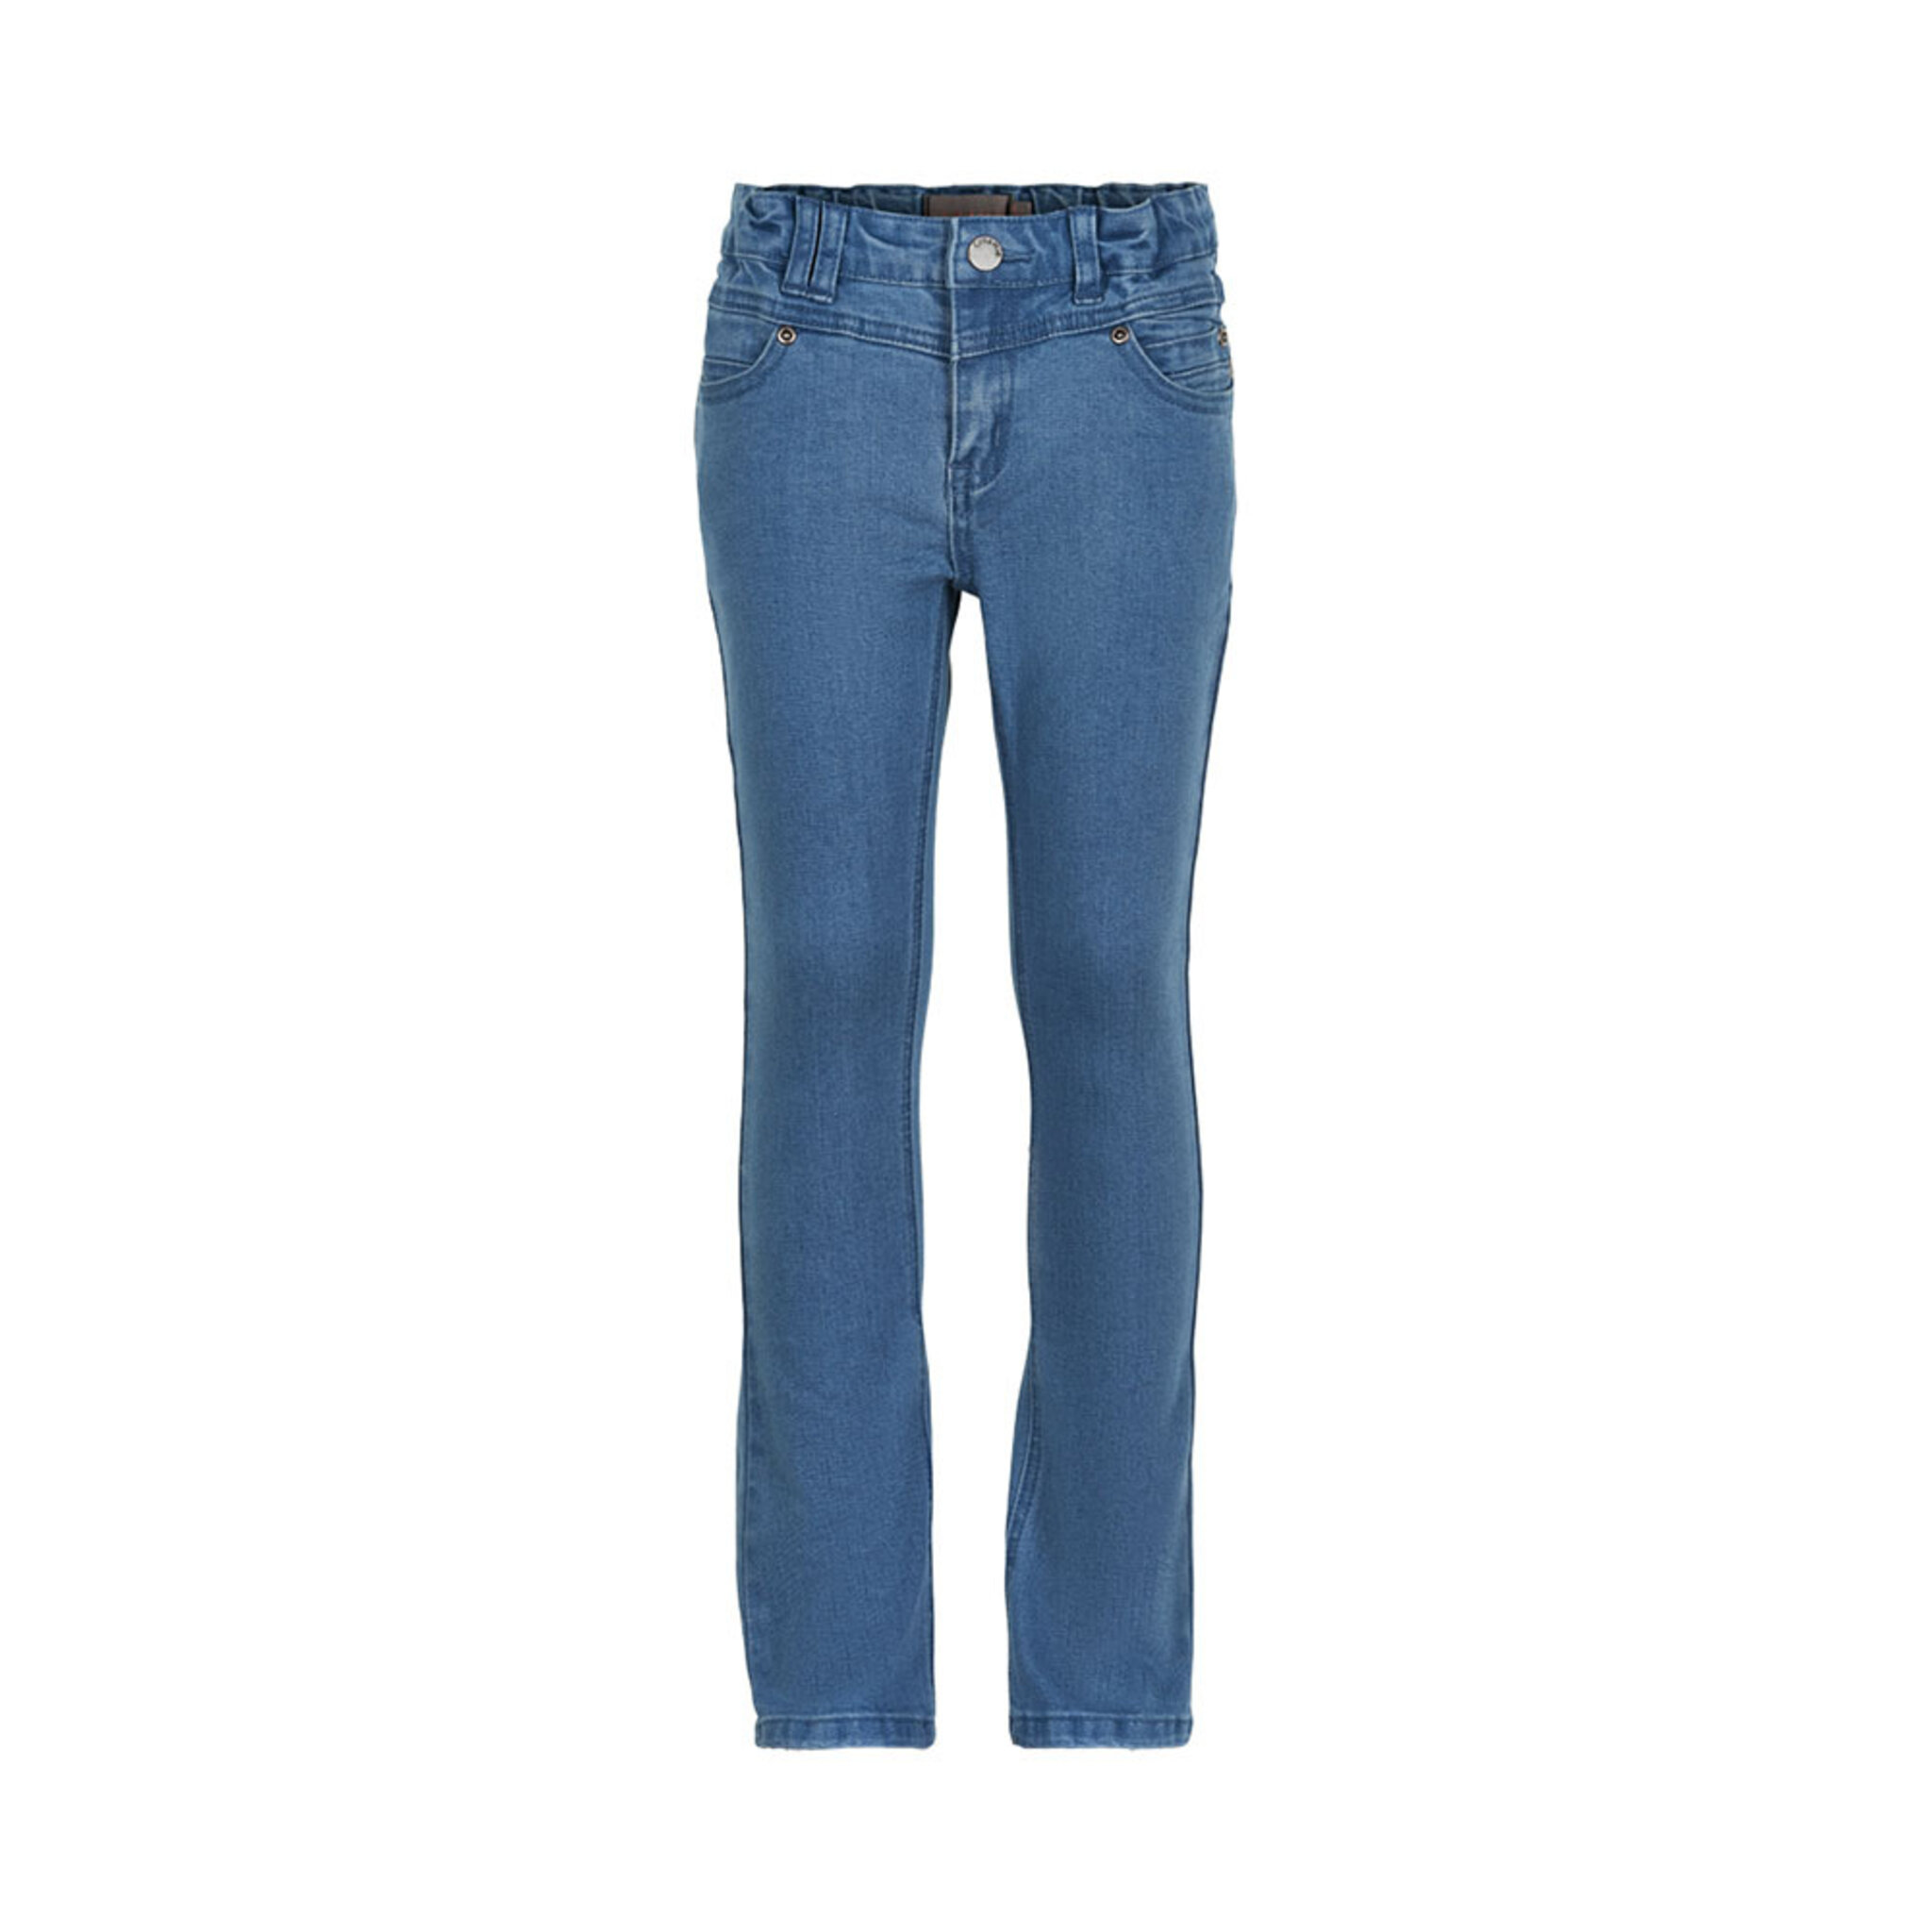 Pants Jeans Denim Flare